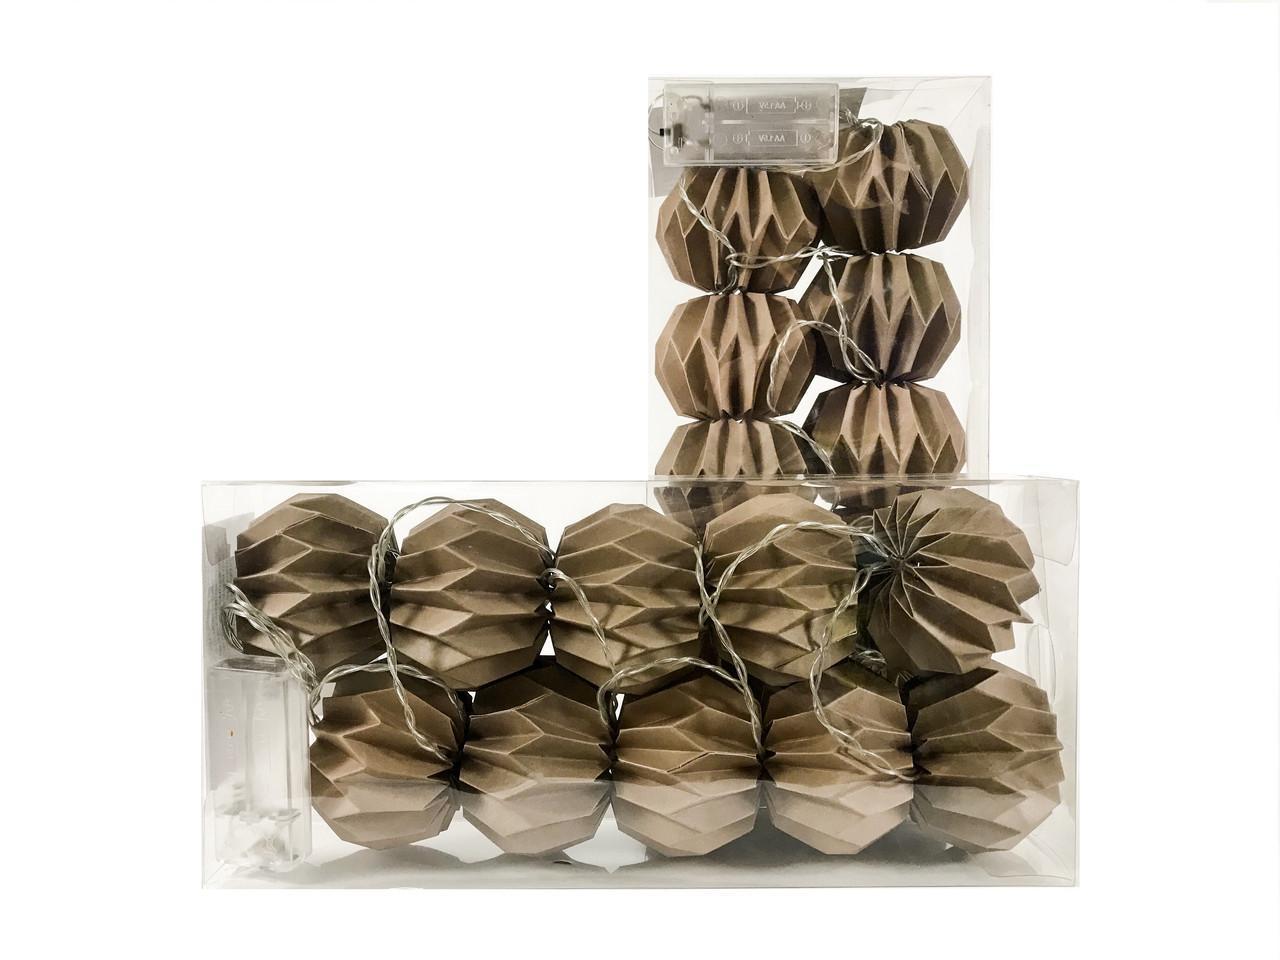 Гірлянда Decorino Capuccino Paper Balls 10led, діам 7.5 см, довжина 235см на батарейках АА